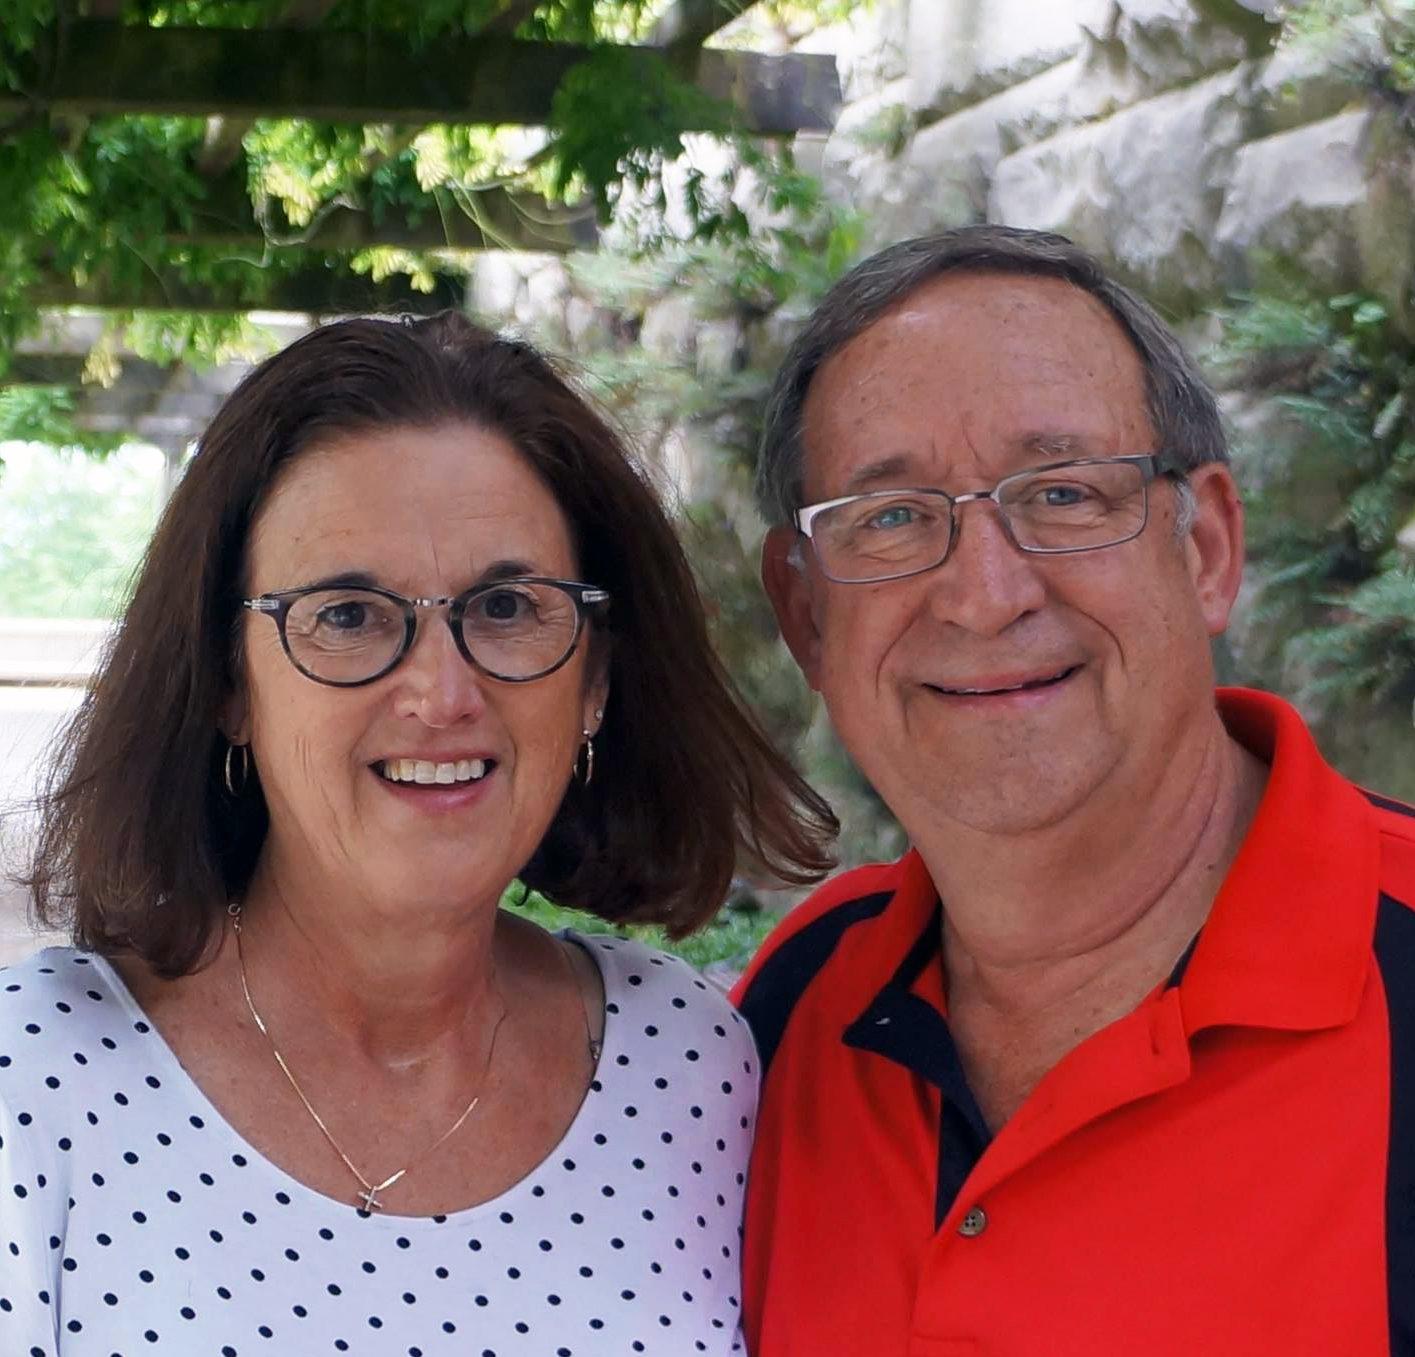 Dr. Don and Claudia Erickson